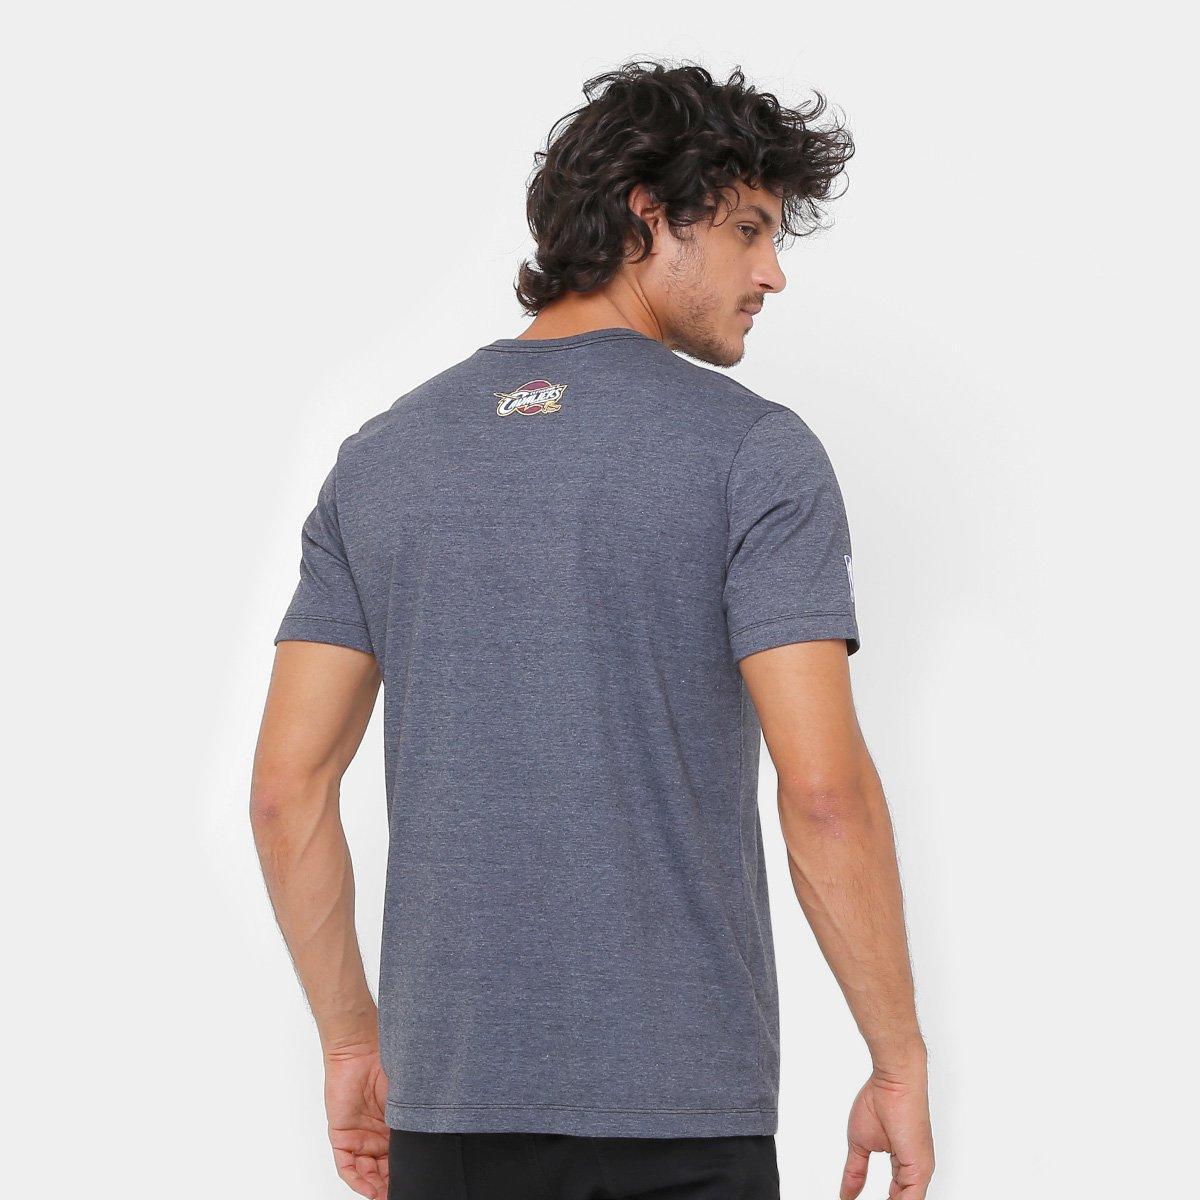 Camiseta NBA Cleveland Cavaliers New Era Masculina - Chumbo - Compre ... 83712e8d5c0dc